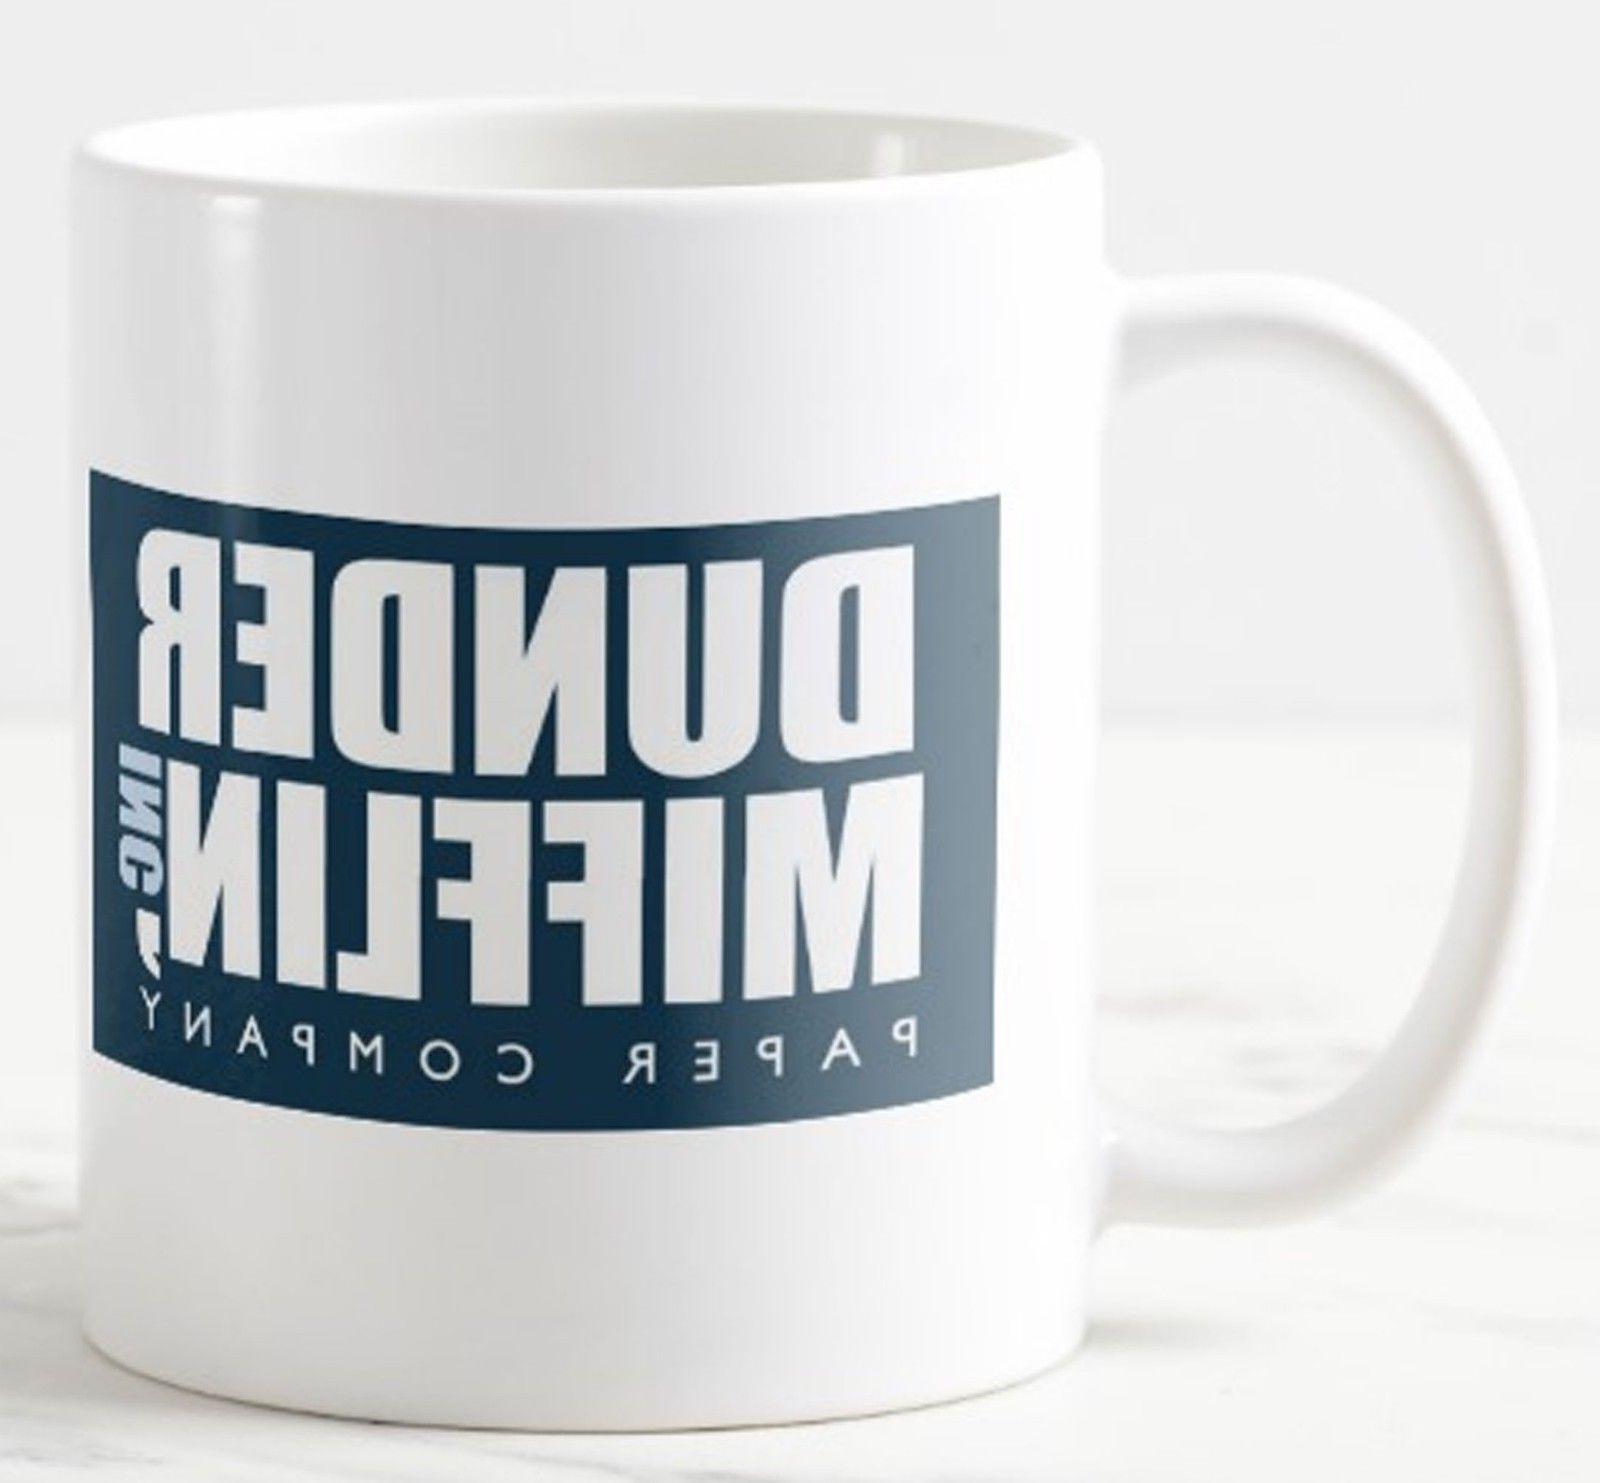 New Mifflin Best Boss Dishwasher Coffee Office